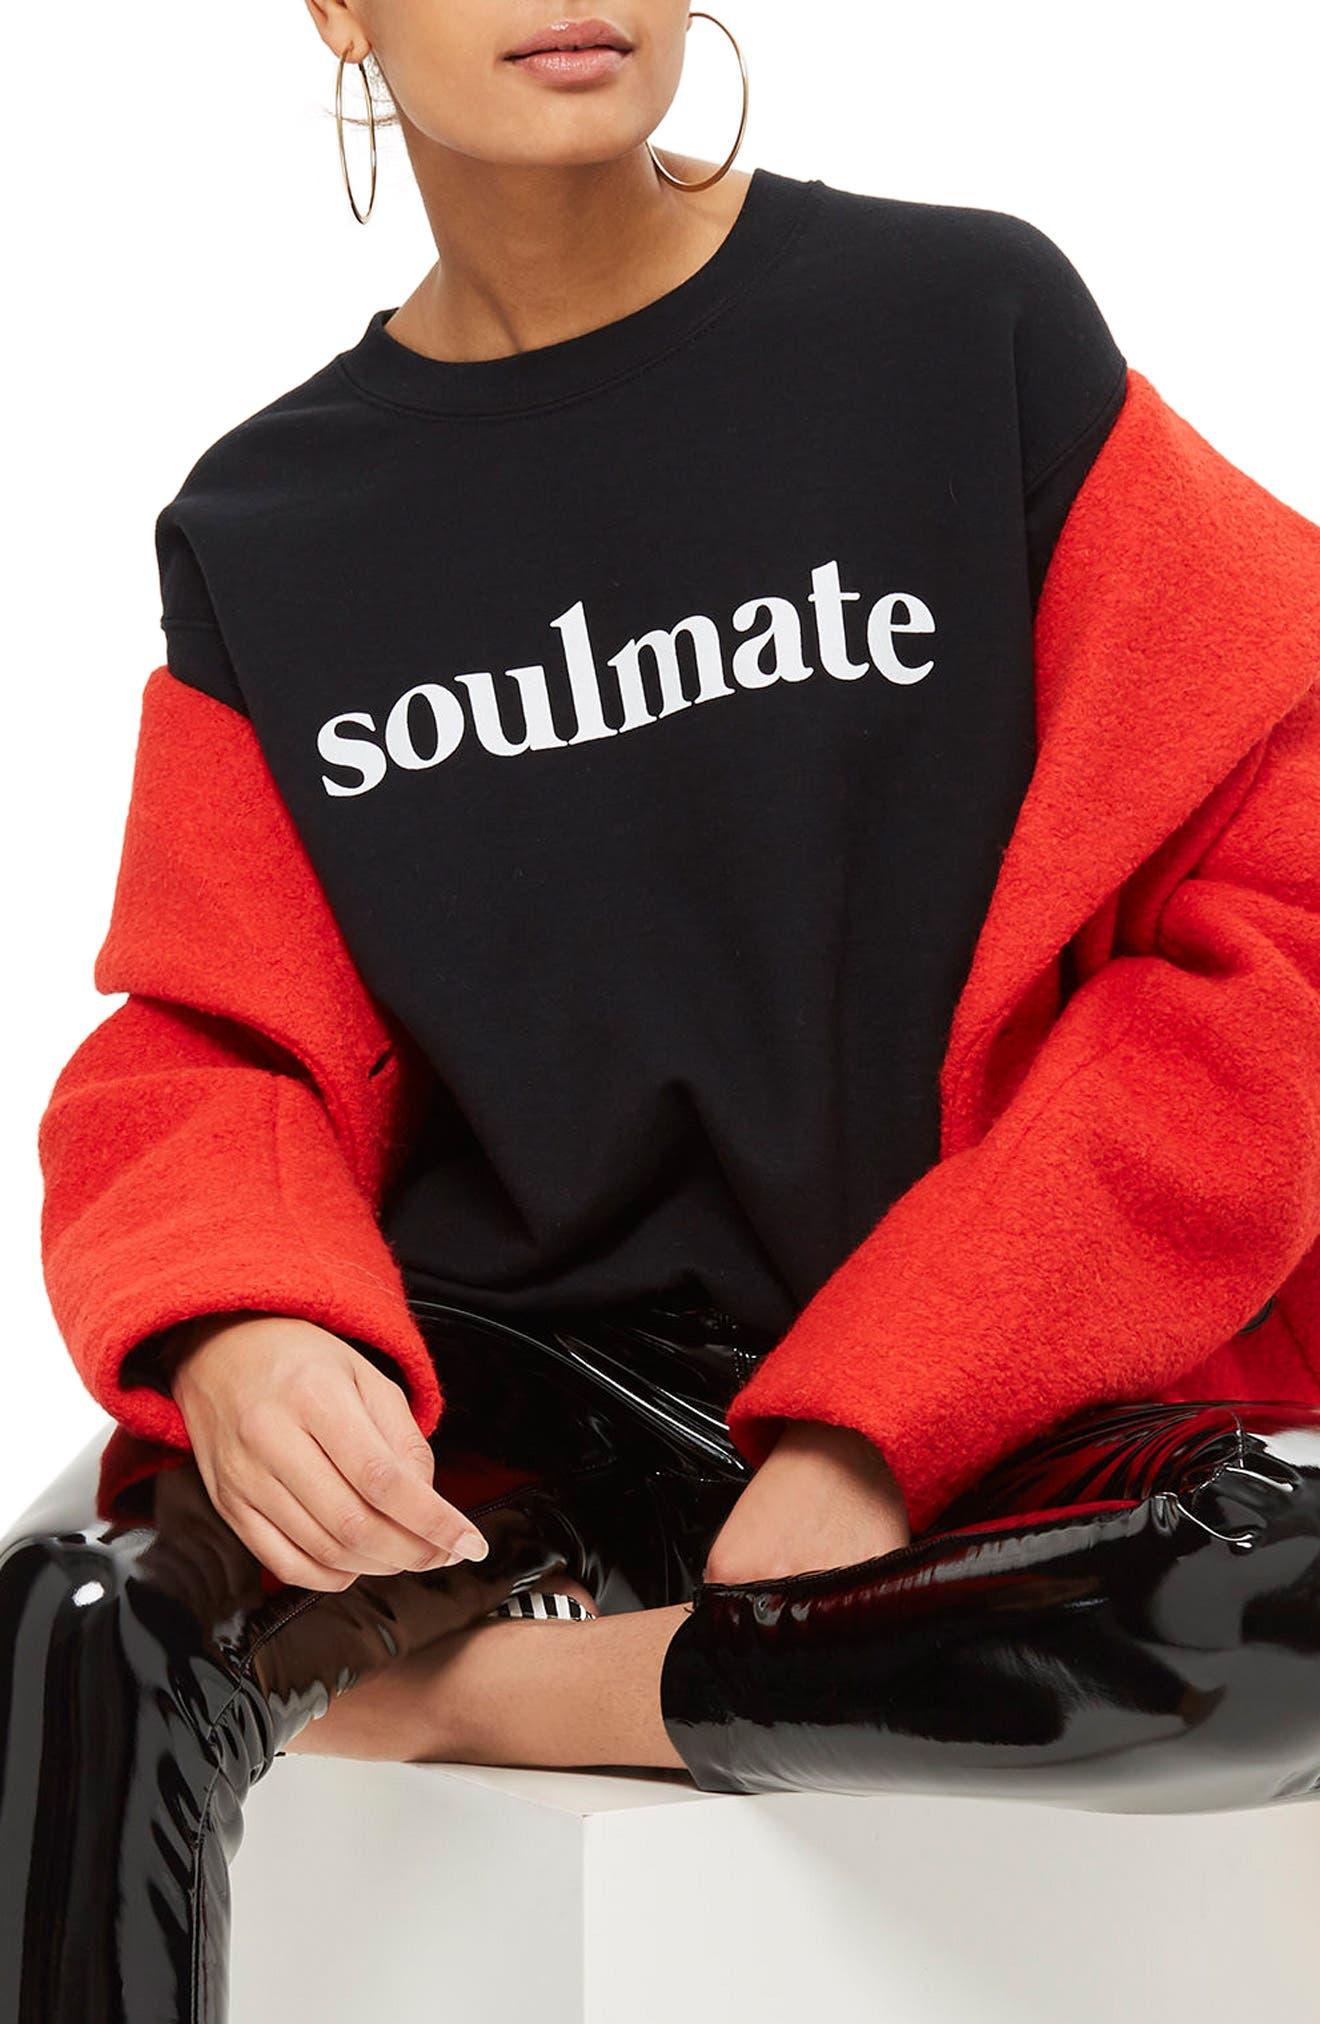 Soulmate Graphic Sweatshirt,                             Main thumbnail 1, color,                             001